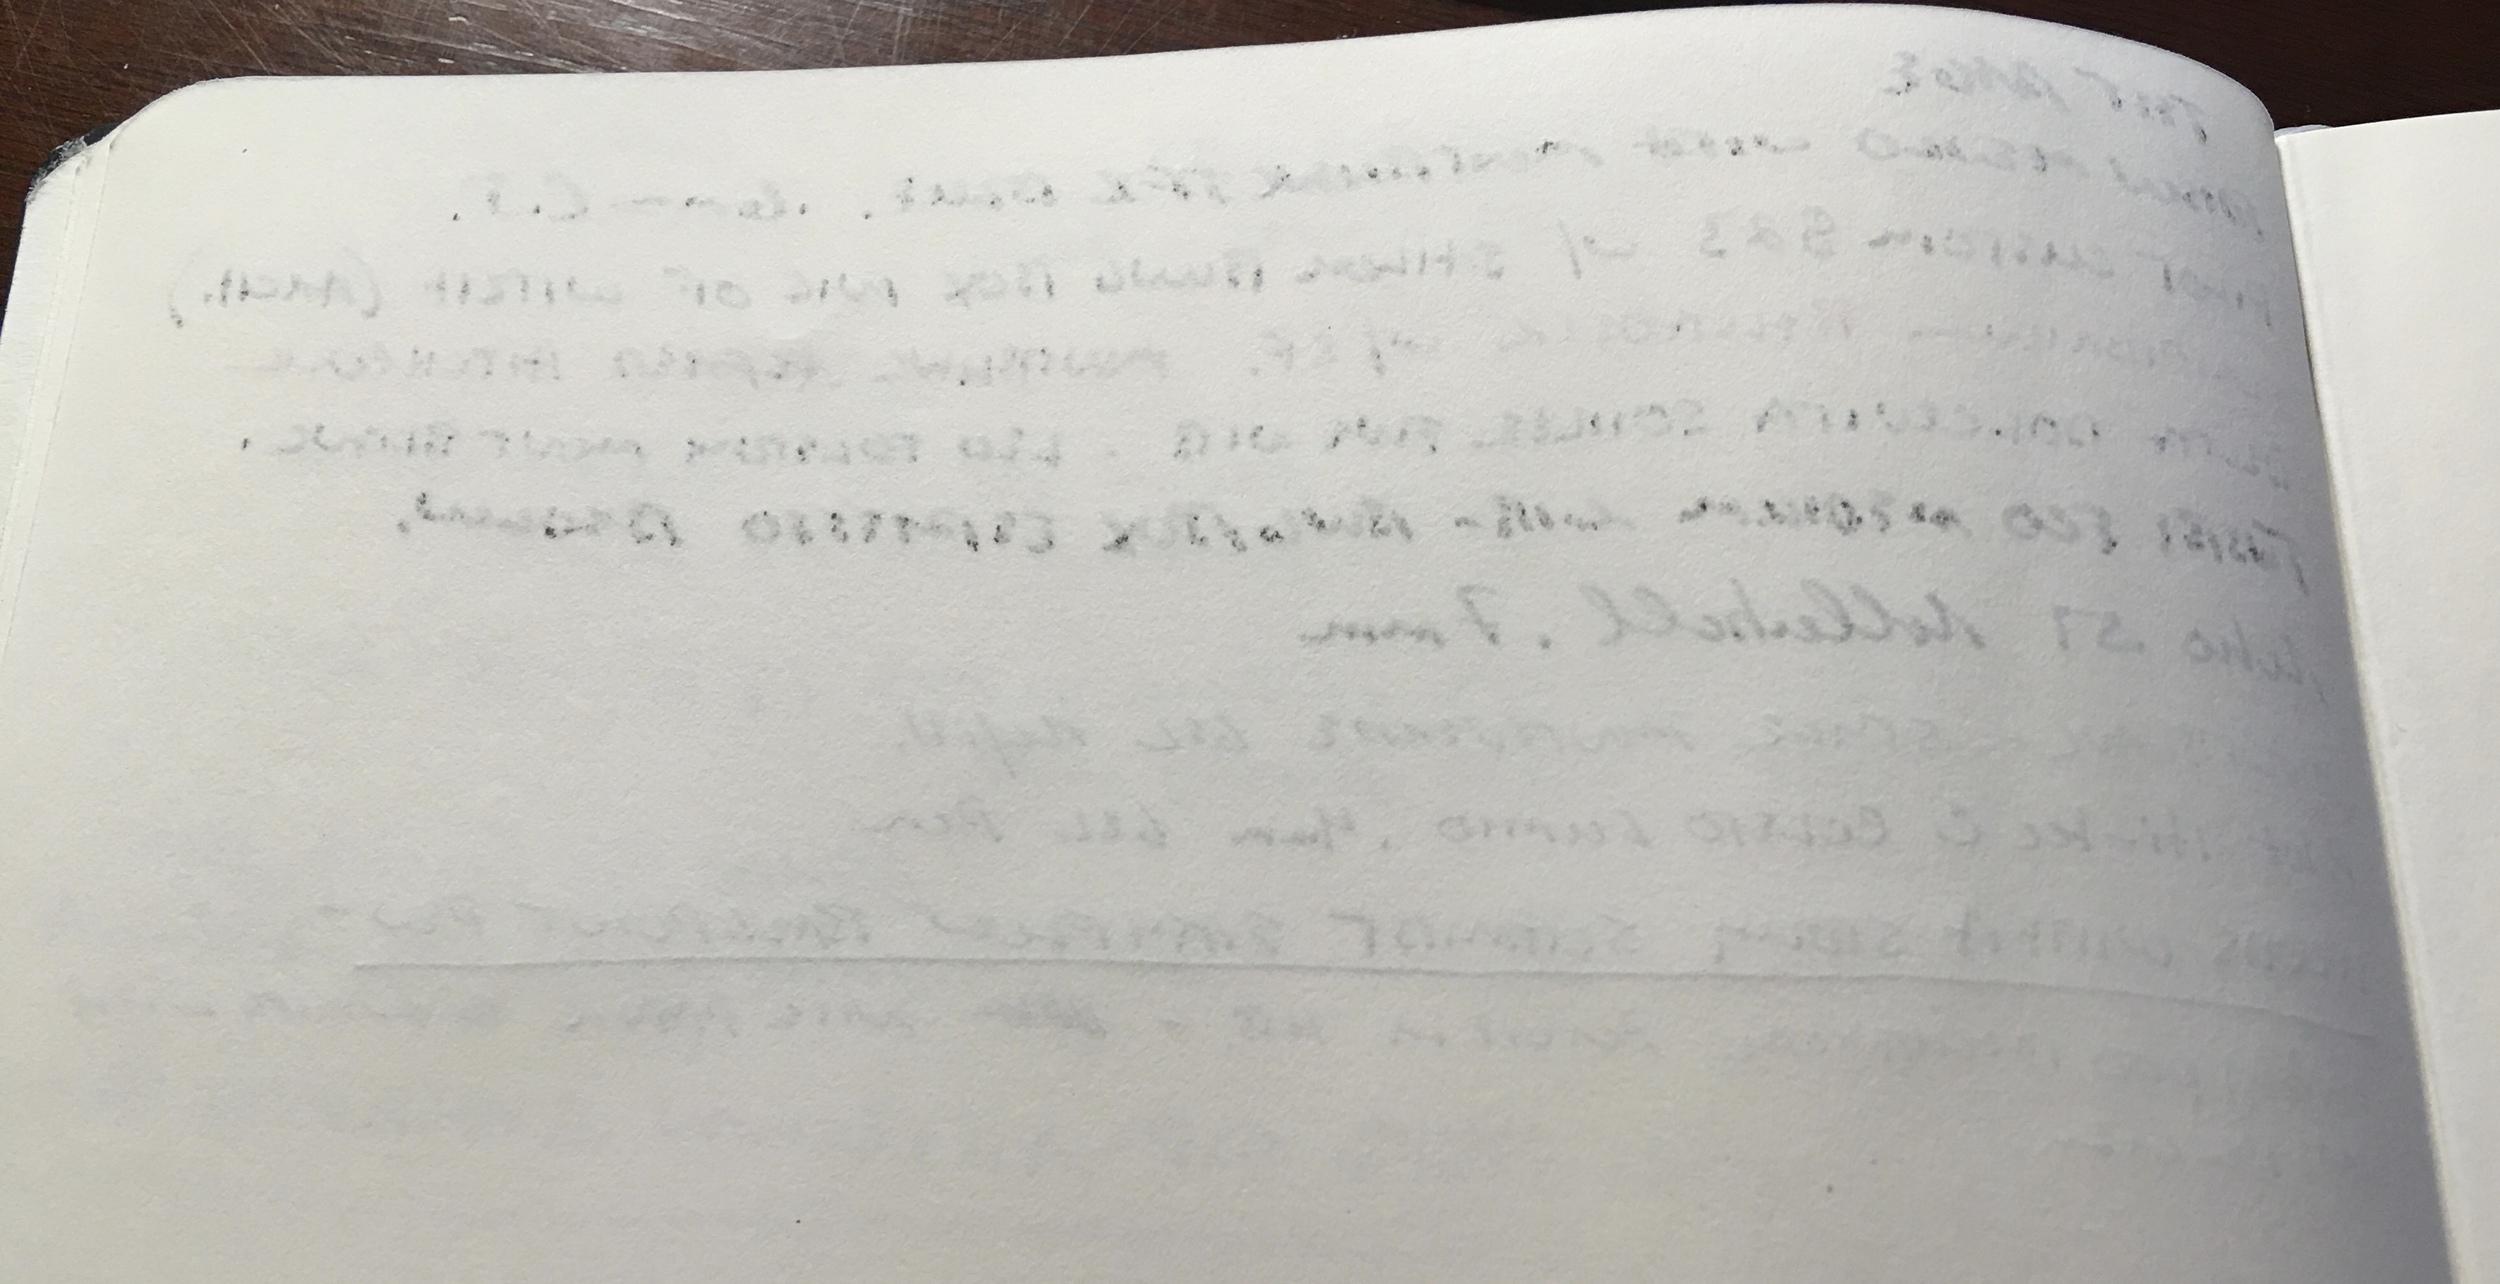 Reverse Monsieur Writing Sample